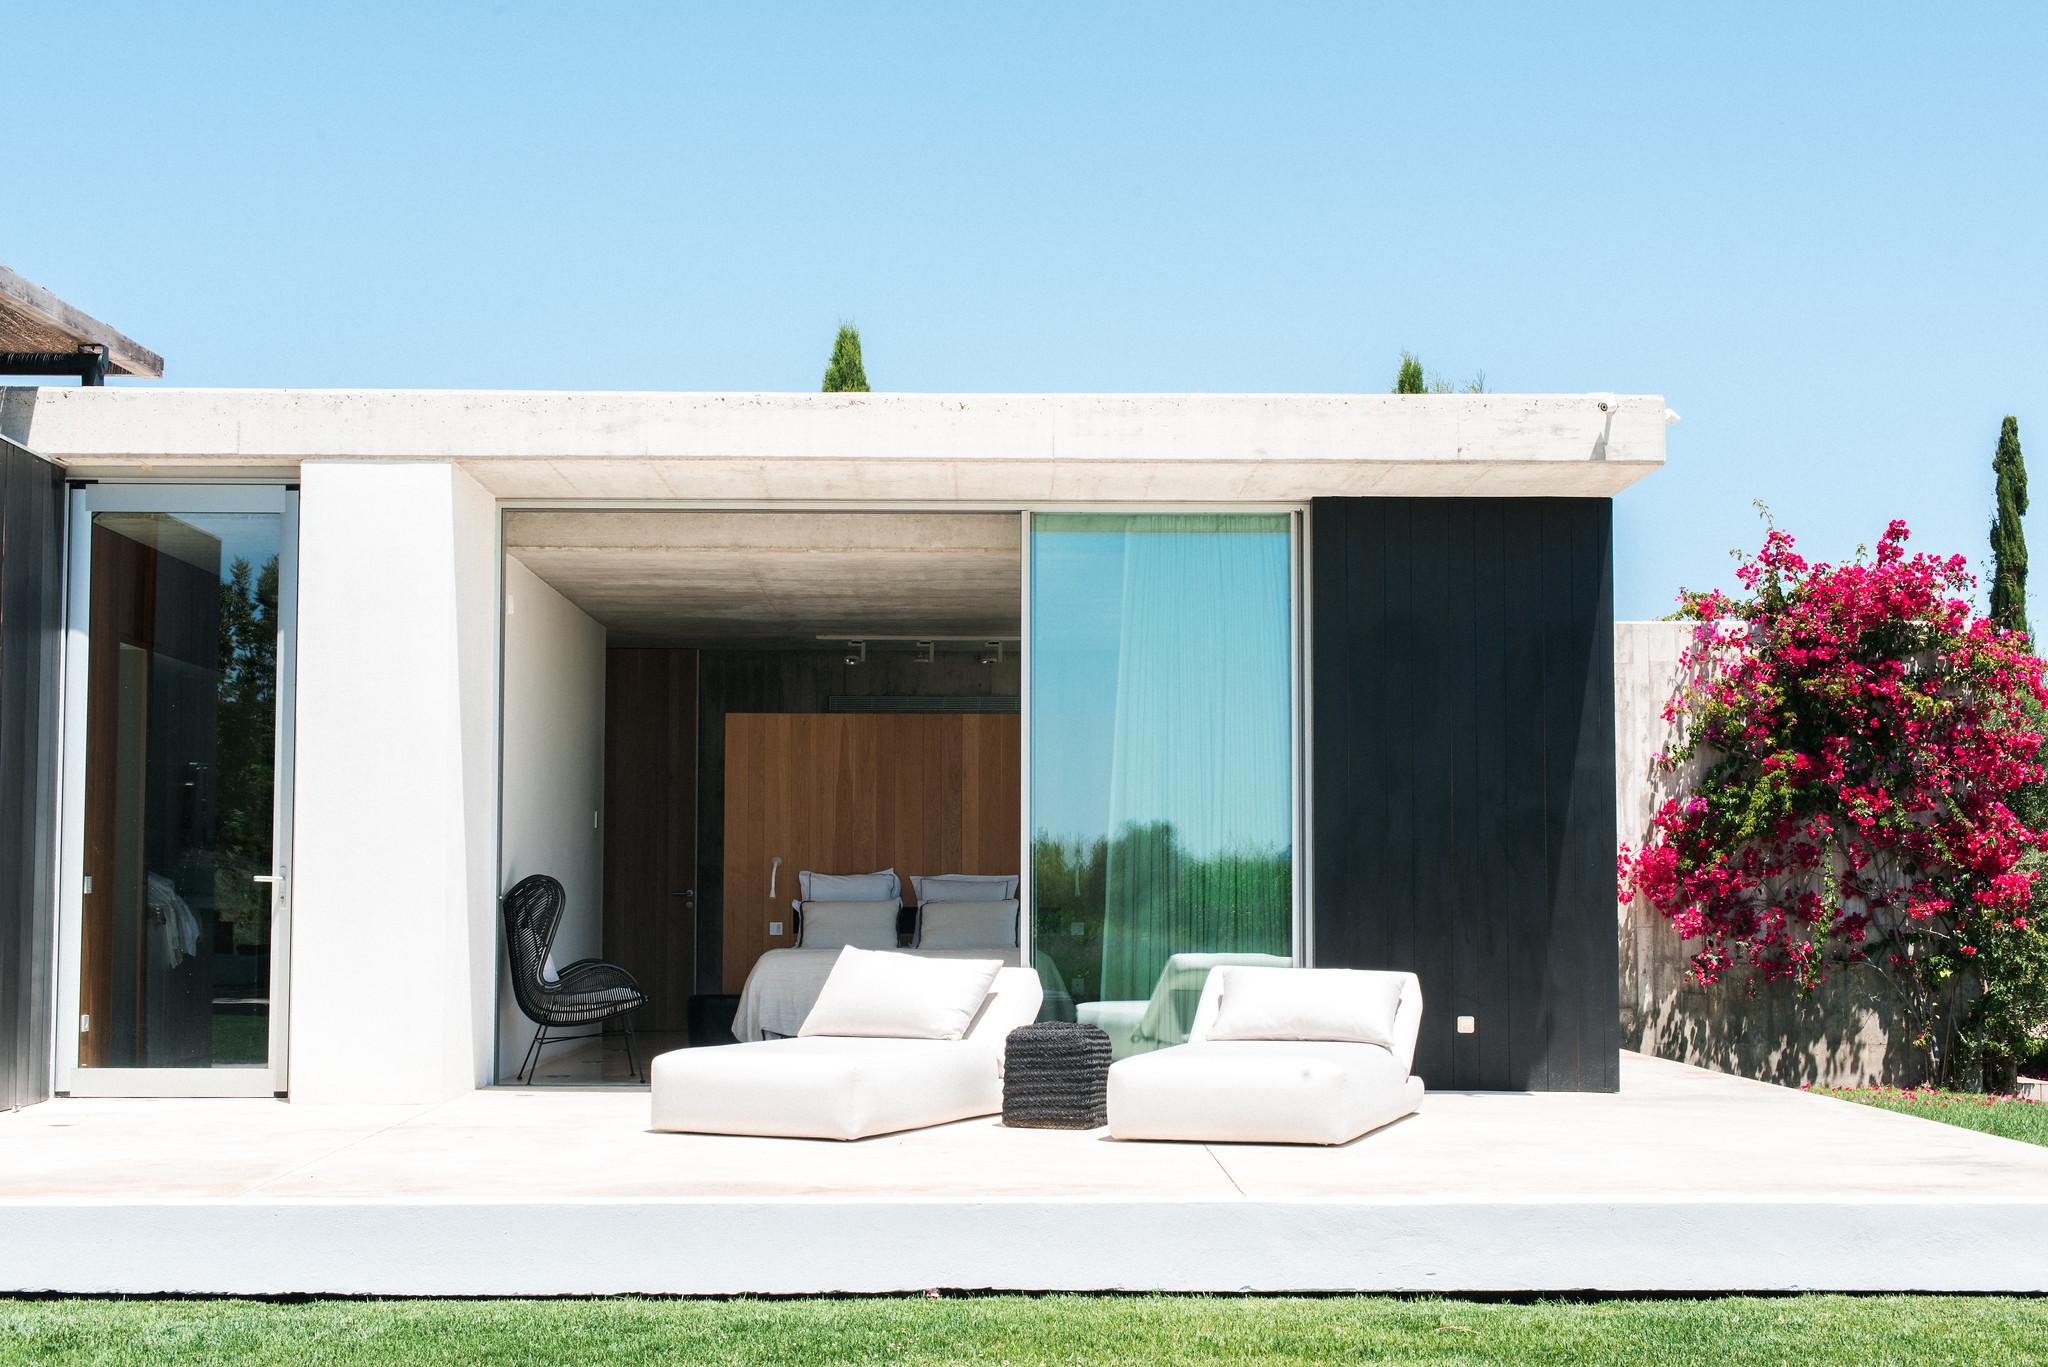 https://www.white-ibiza.com/wp-content/uploads/2020/06/white-ibiza-villas-casa-valentina-exterior-terrace.jpg